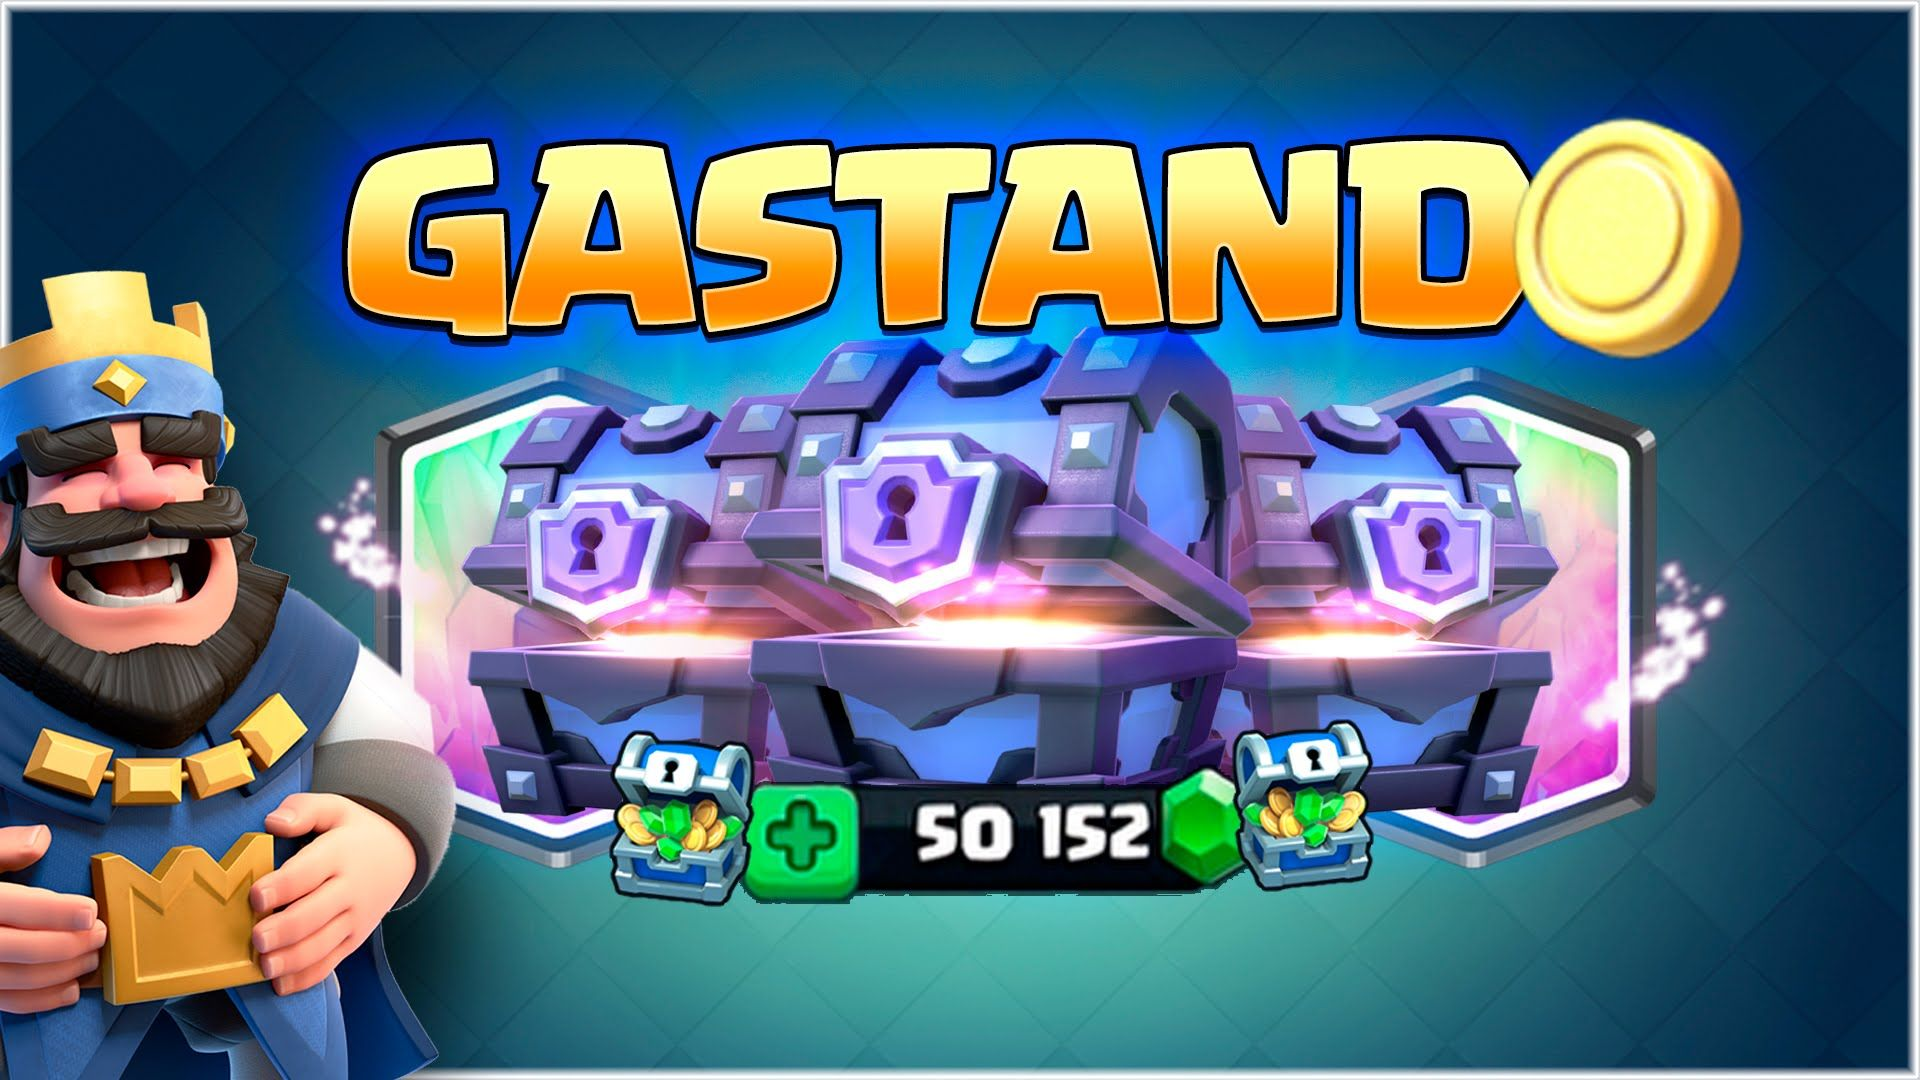 Clash royale hack 2020 free clash royale gem generator